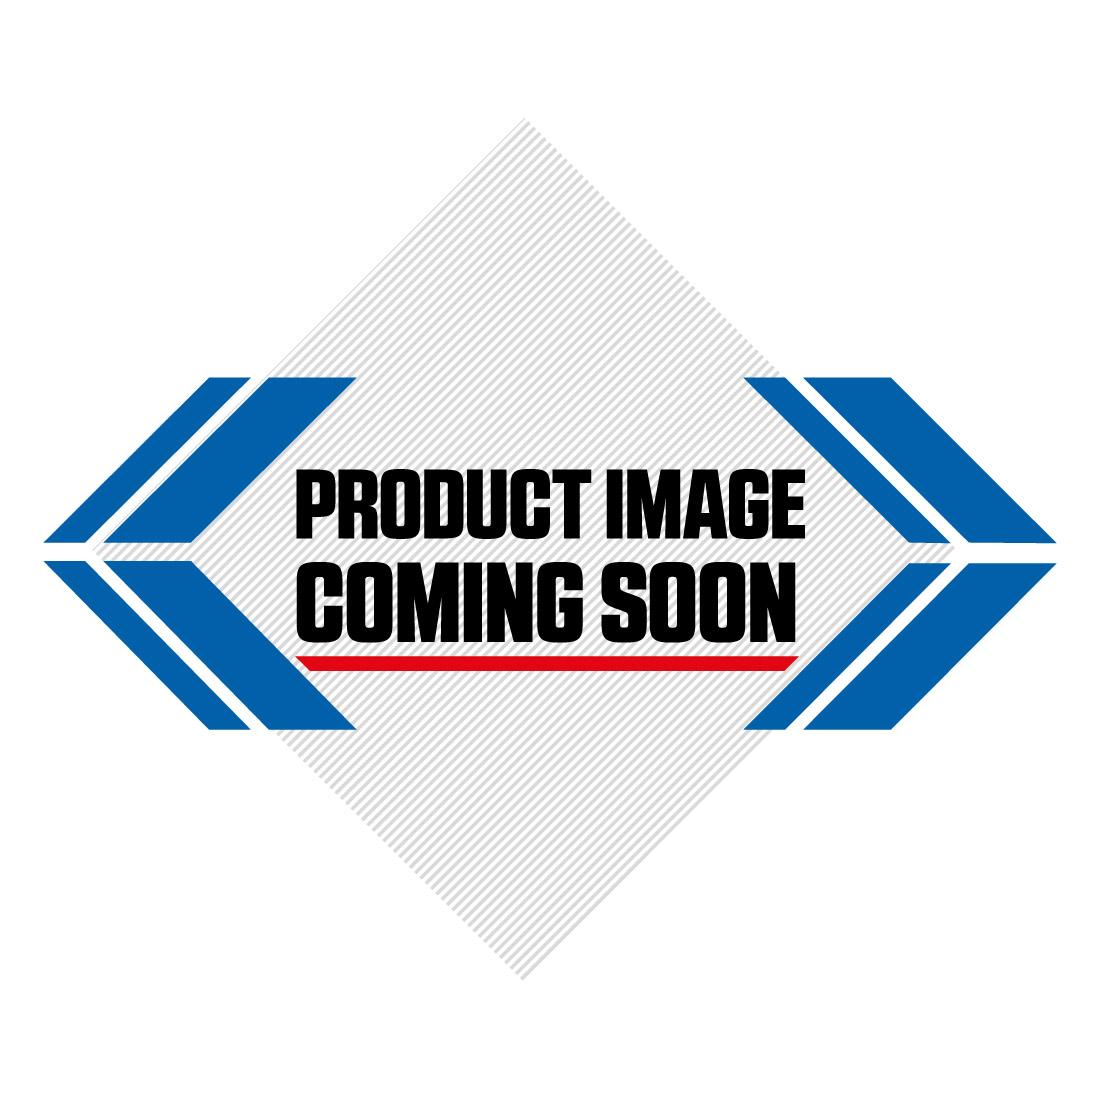 Kawasaki Restyled Plastic Kit KX 85 (2010) OEM Factory Image-3>